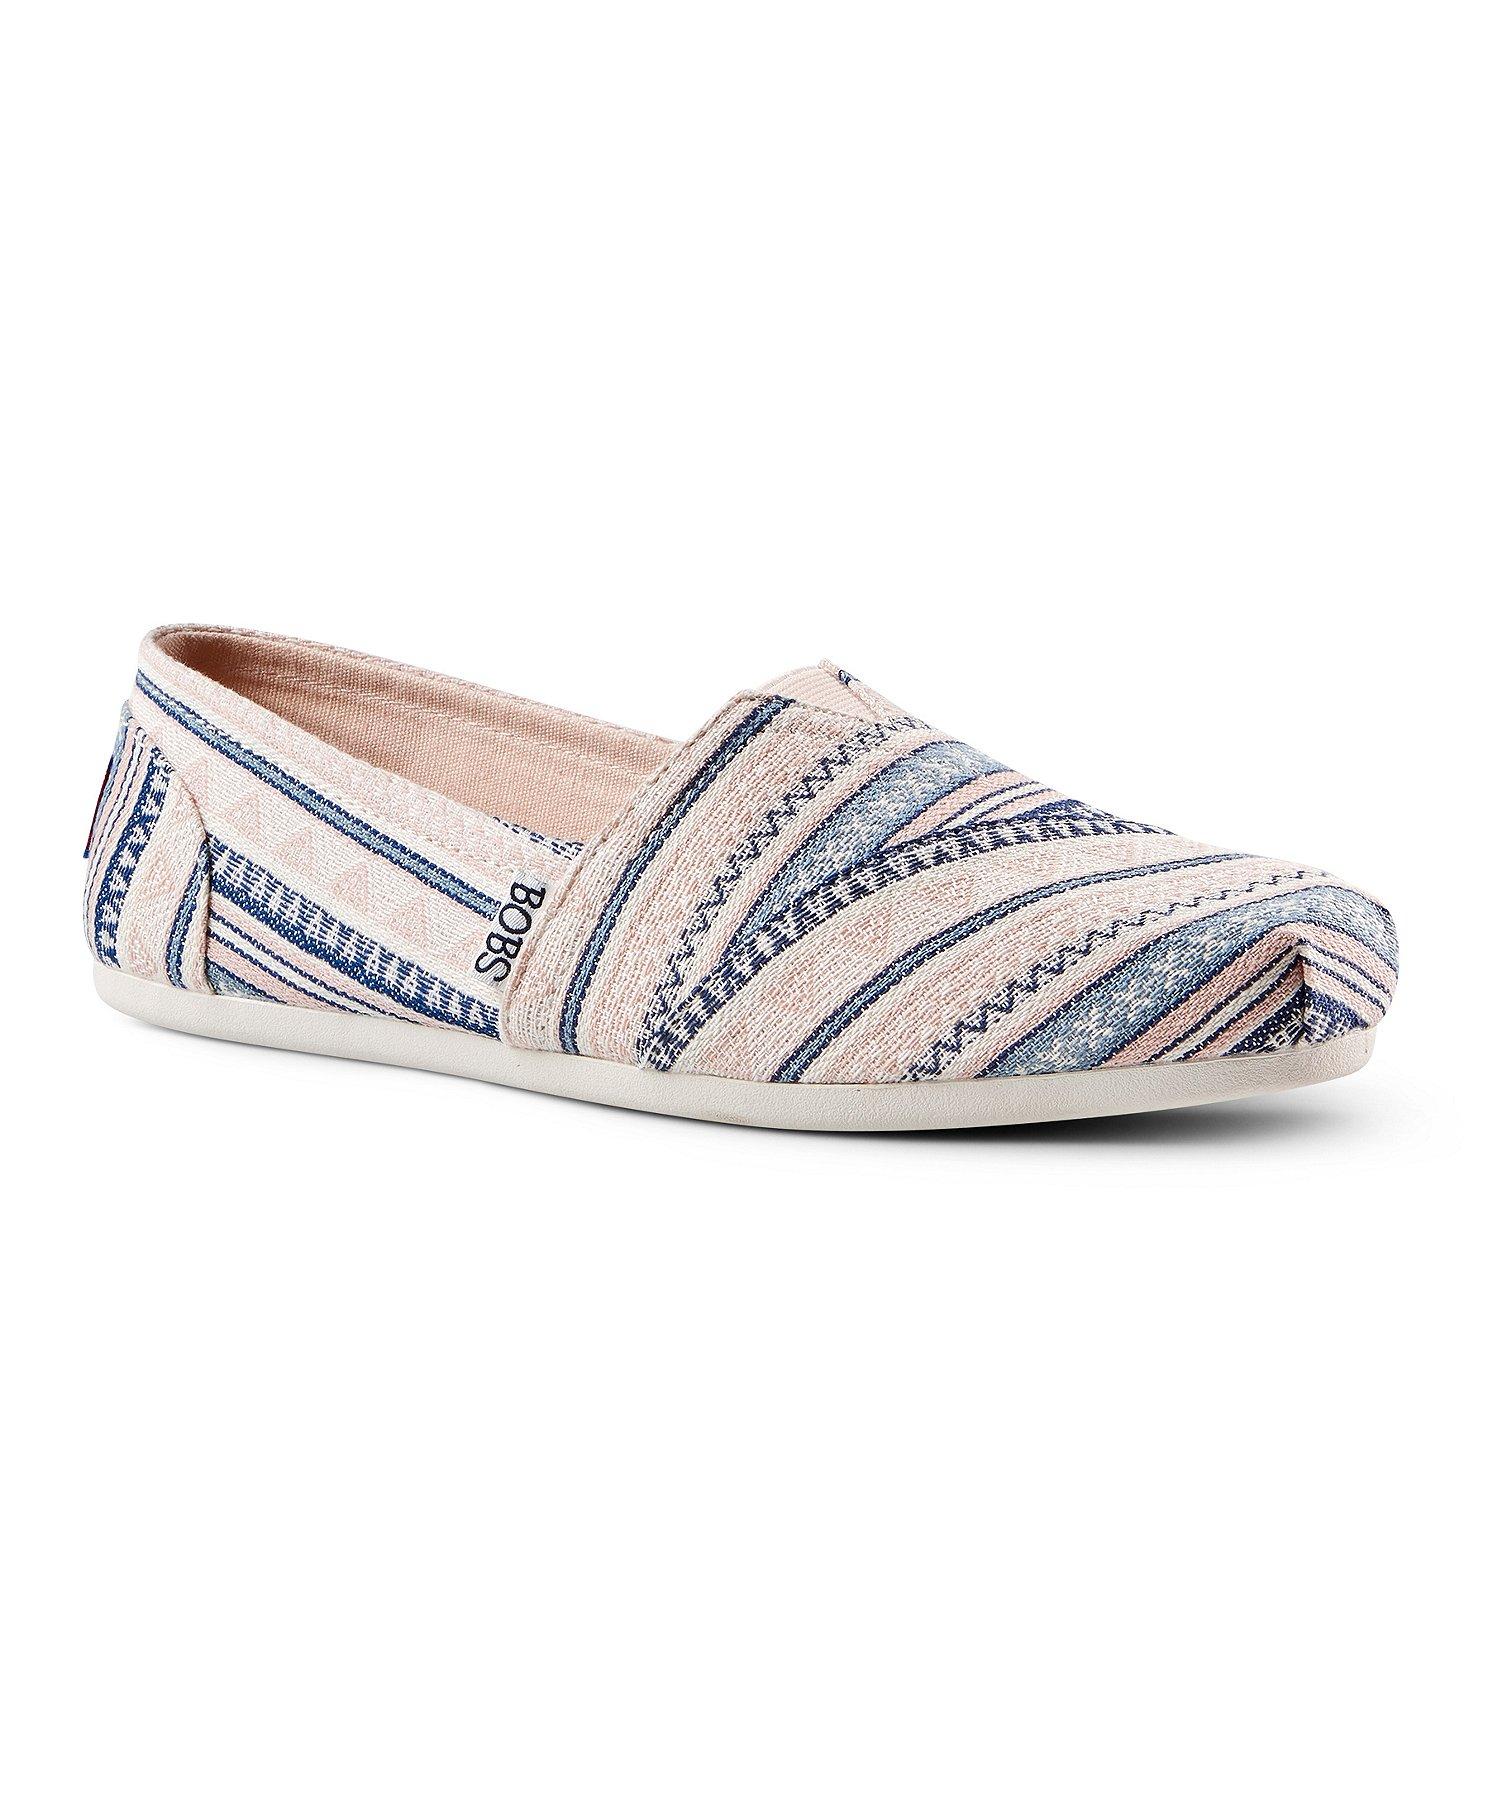 Women's Bobs Plush Lil Fox Slip On Shoes